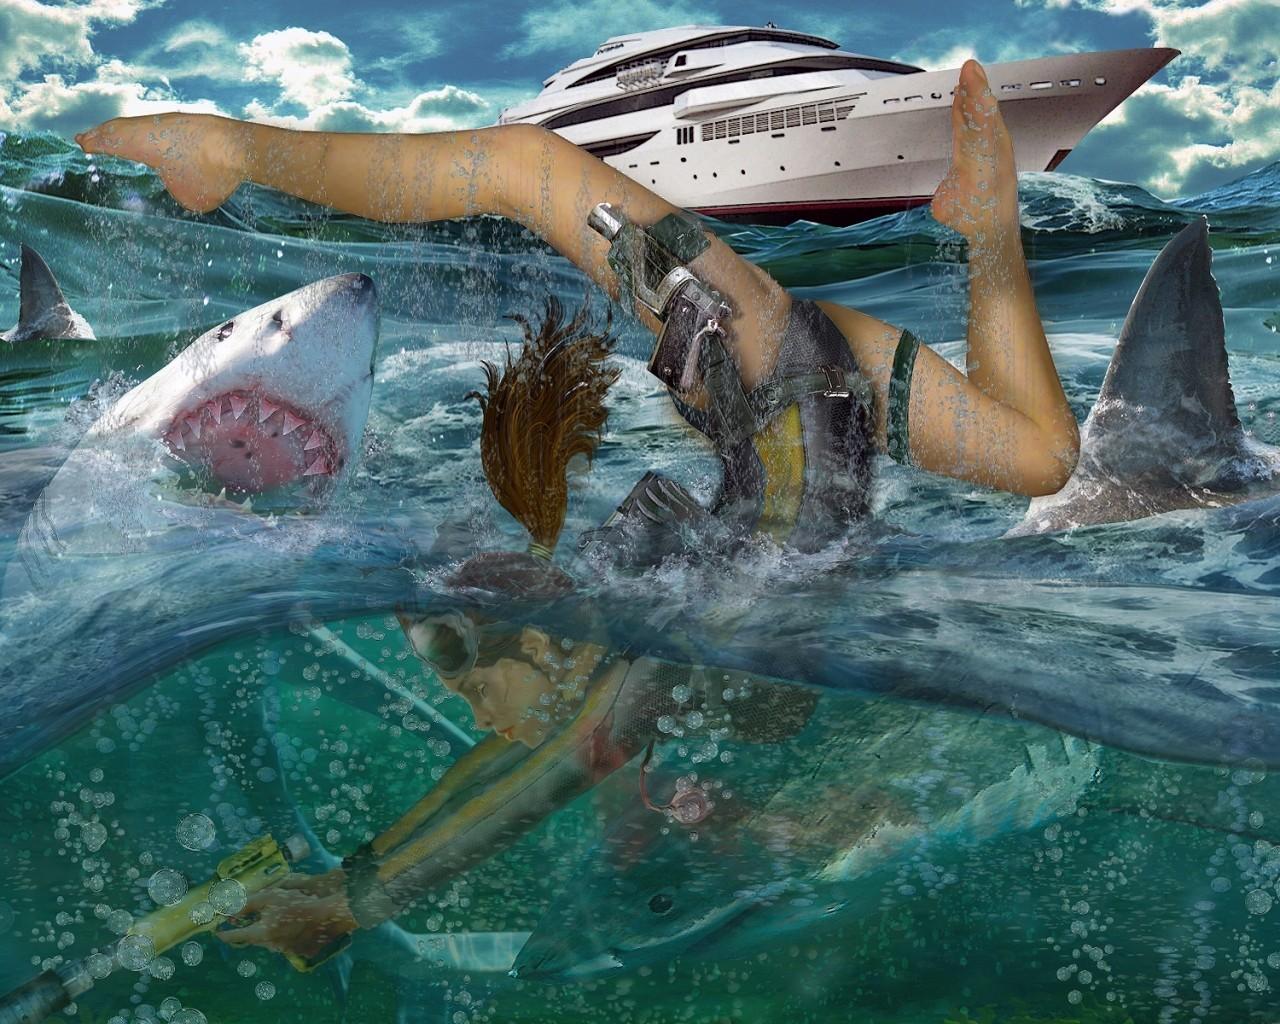 лара крофт подводная лодка